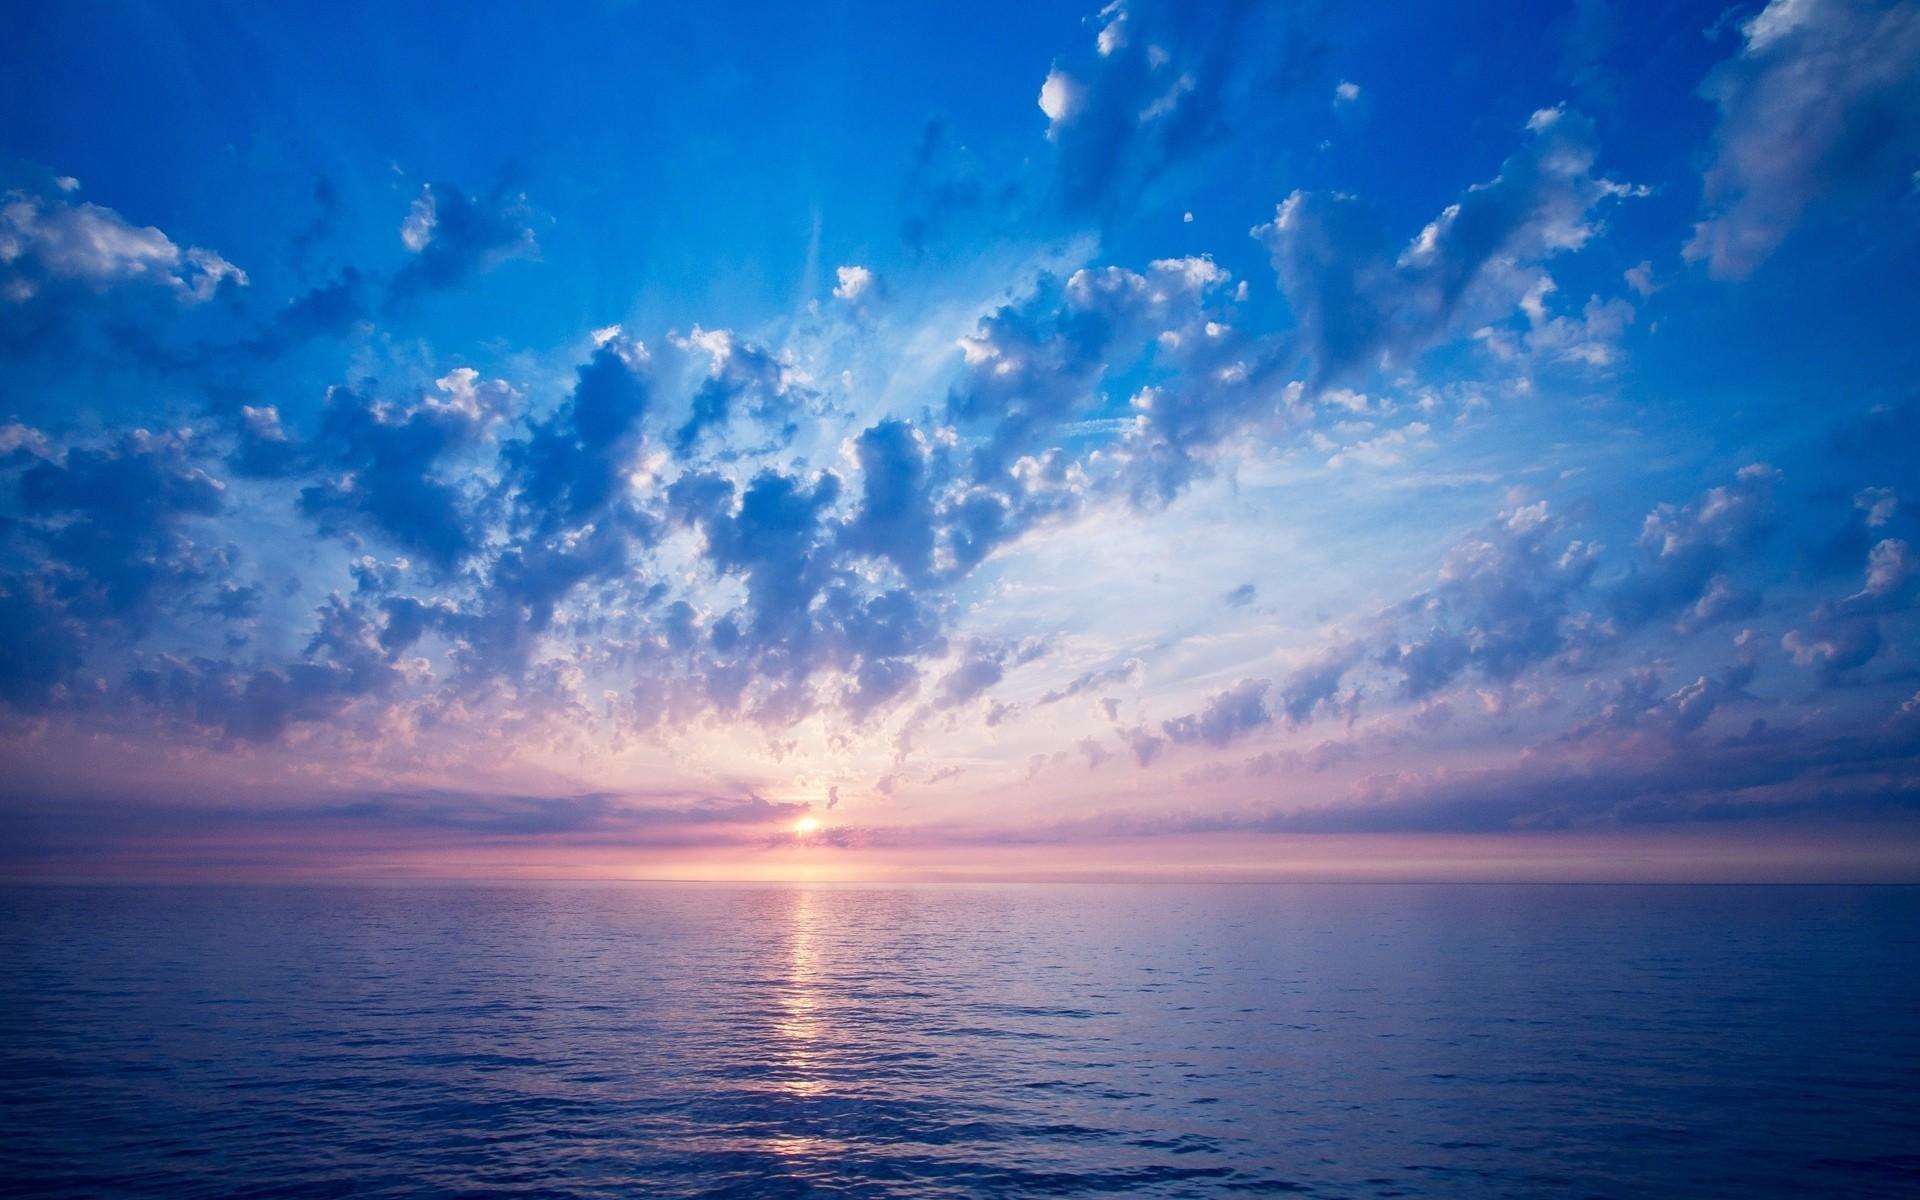 Blue Sky Wallpaper Background (64+ images)